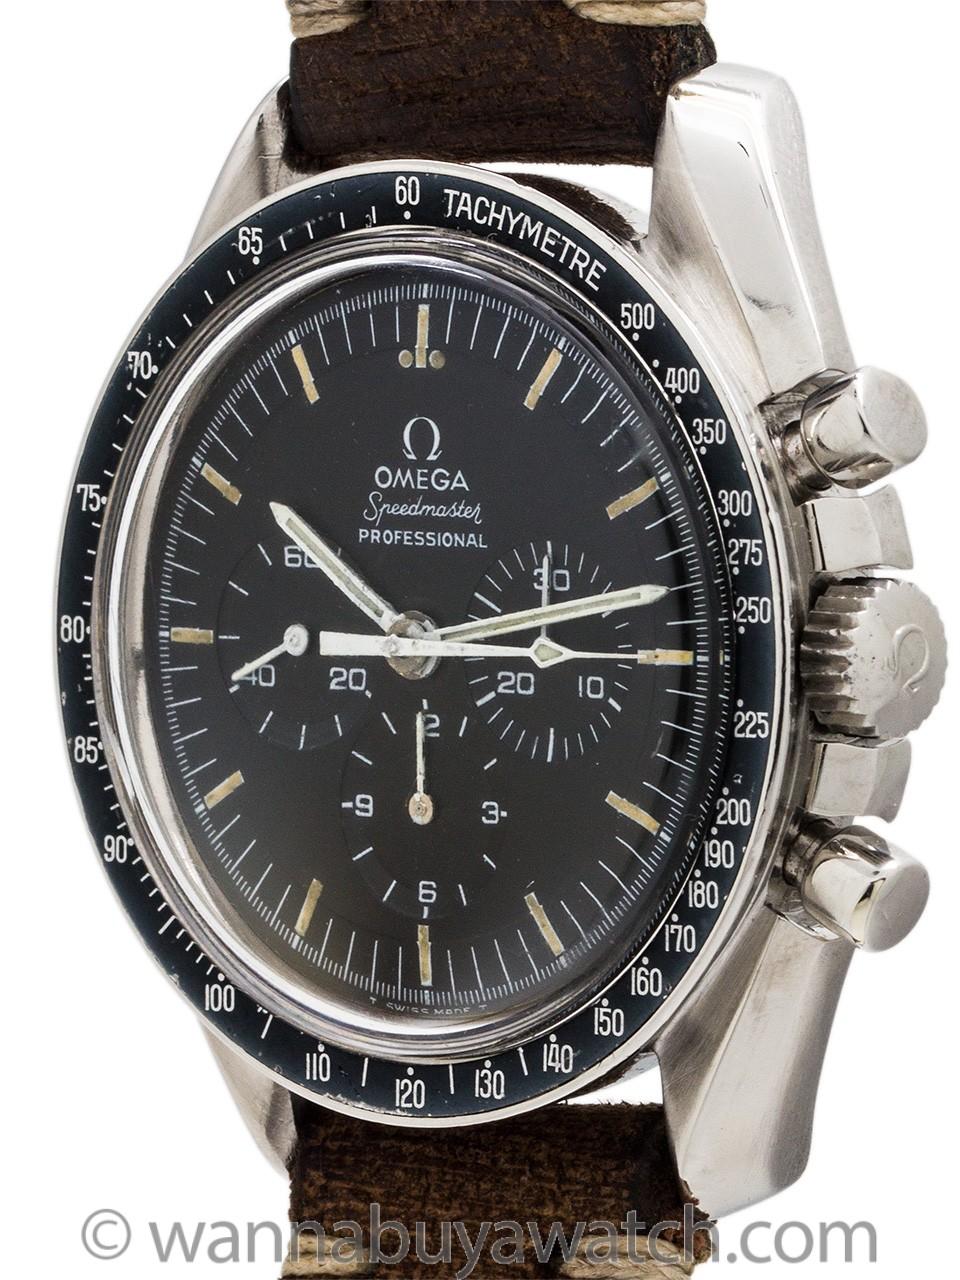 Omega Speedmaster Pre Man on the Moon ref 145.022-69 circa 1969